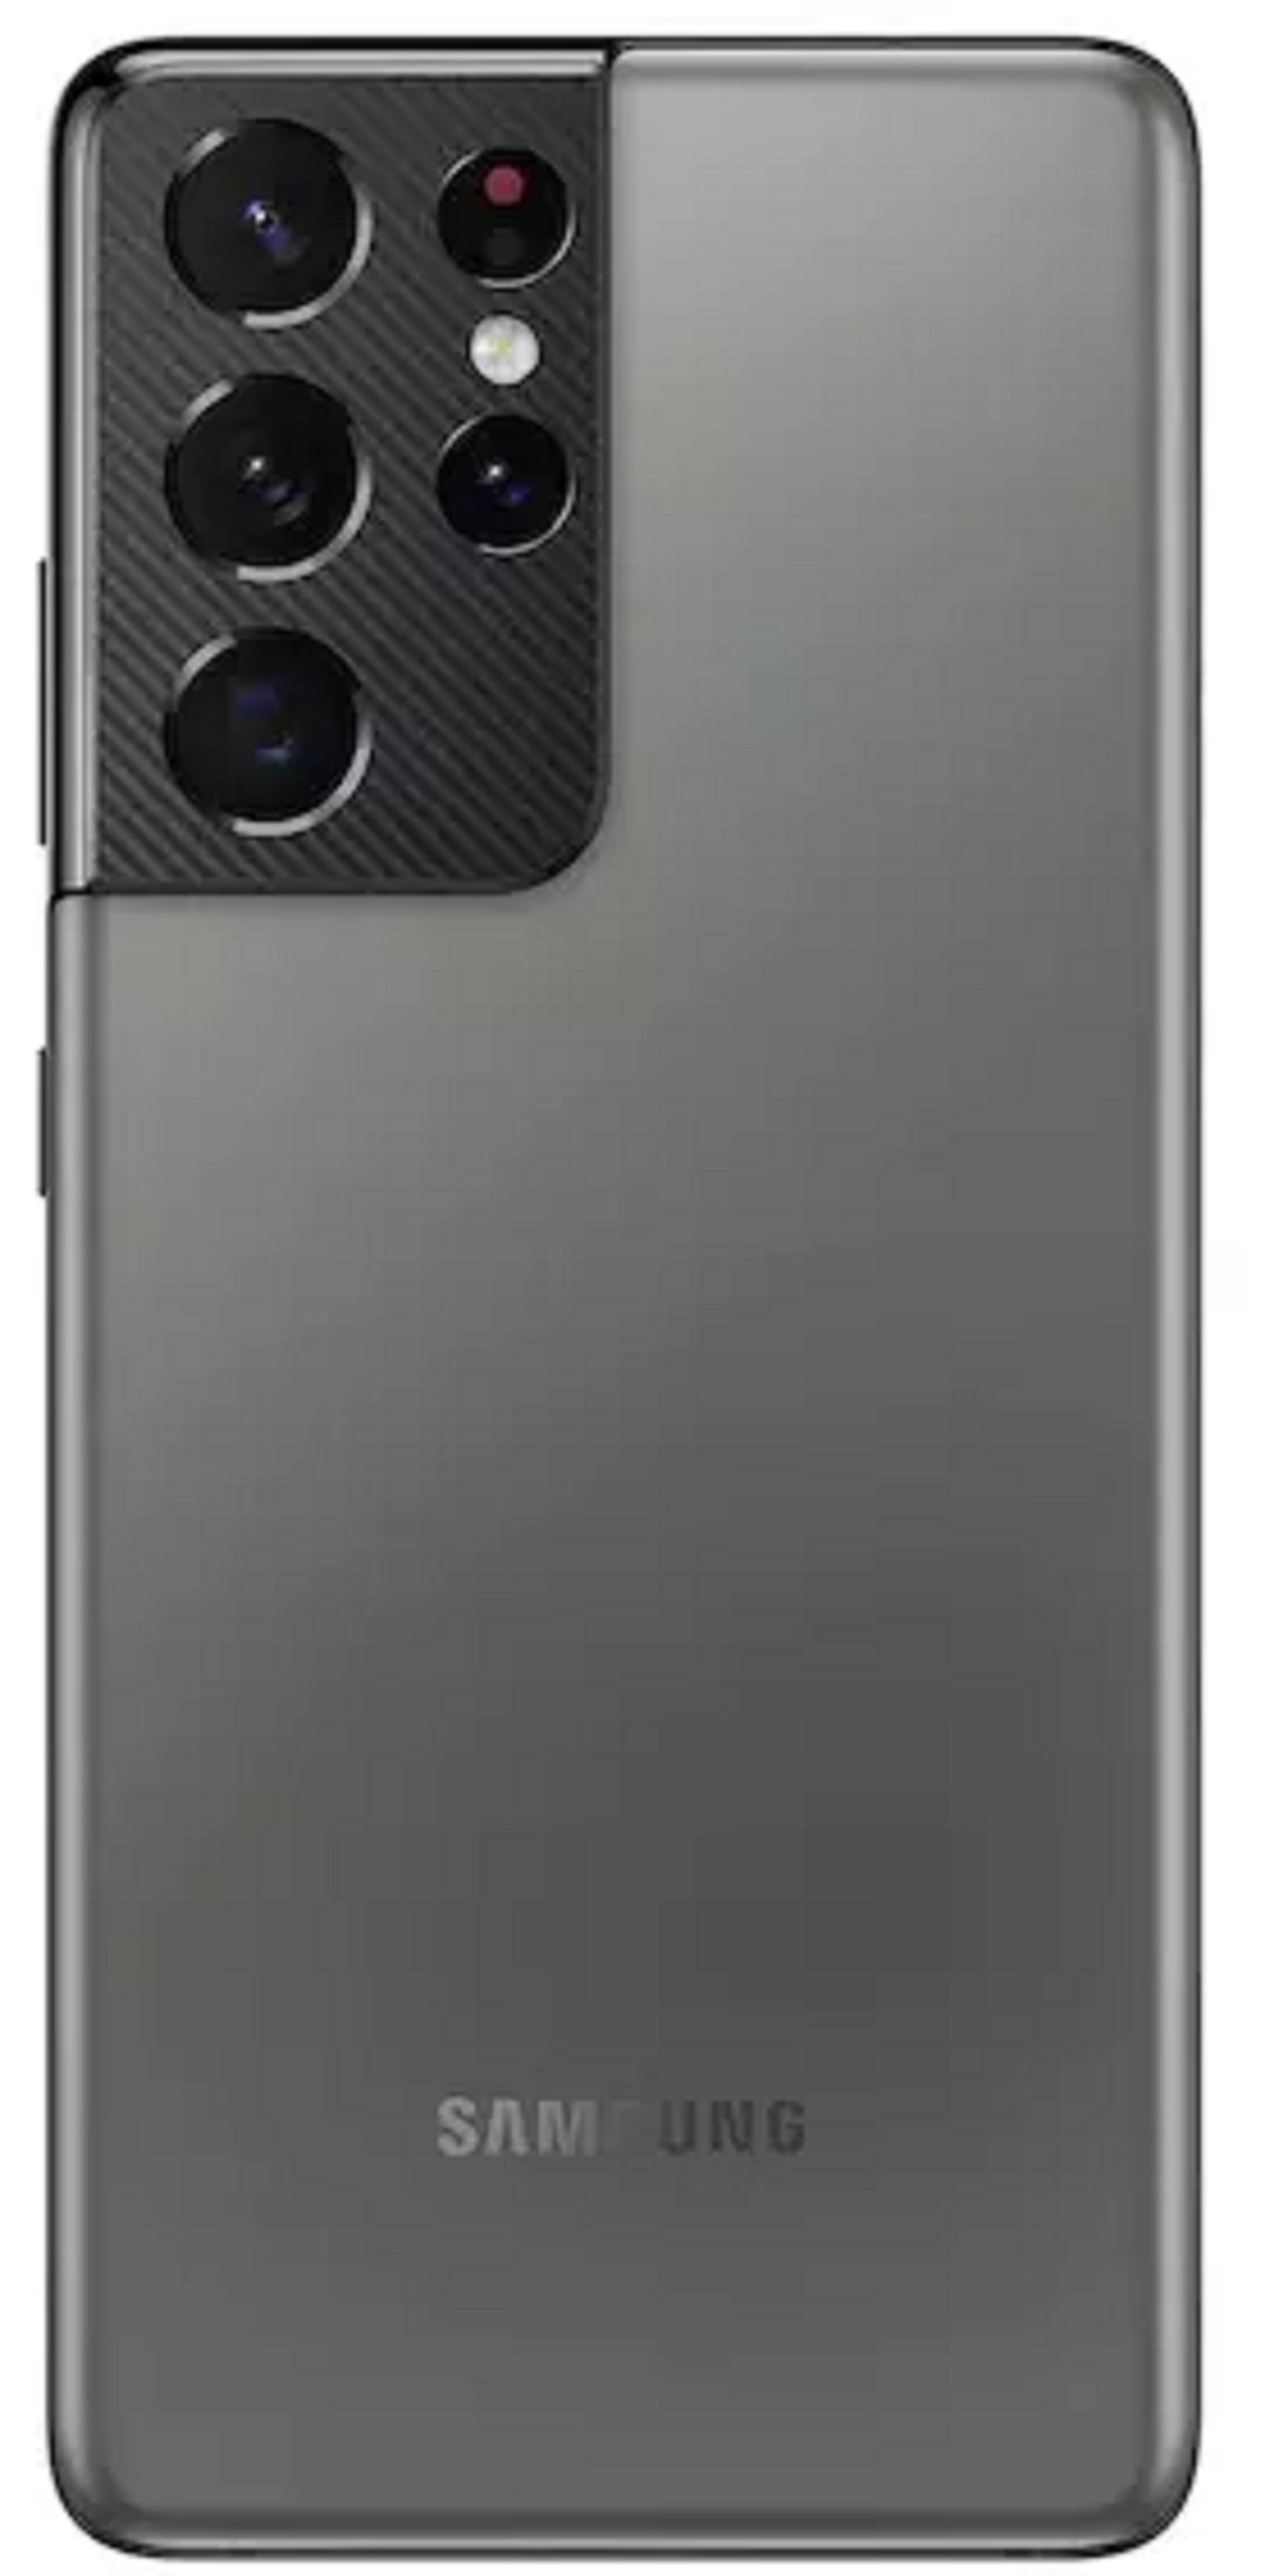 thumbnail 23 - Samsung Galaxy G998U S21 Ultra 5G 128GB Unlocked Smartphone - Excellent